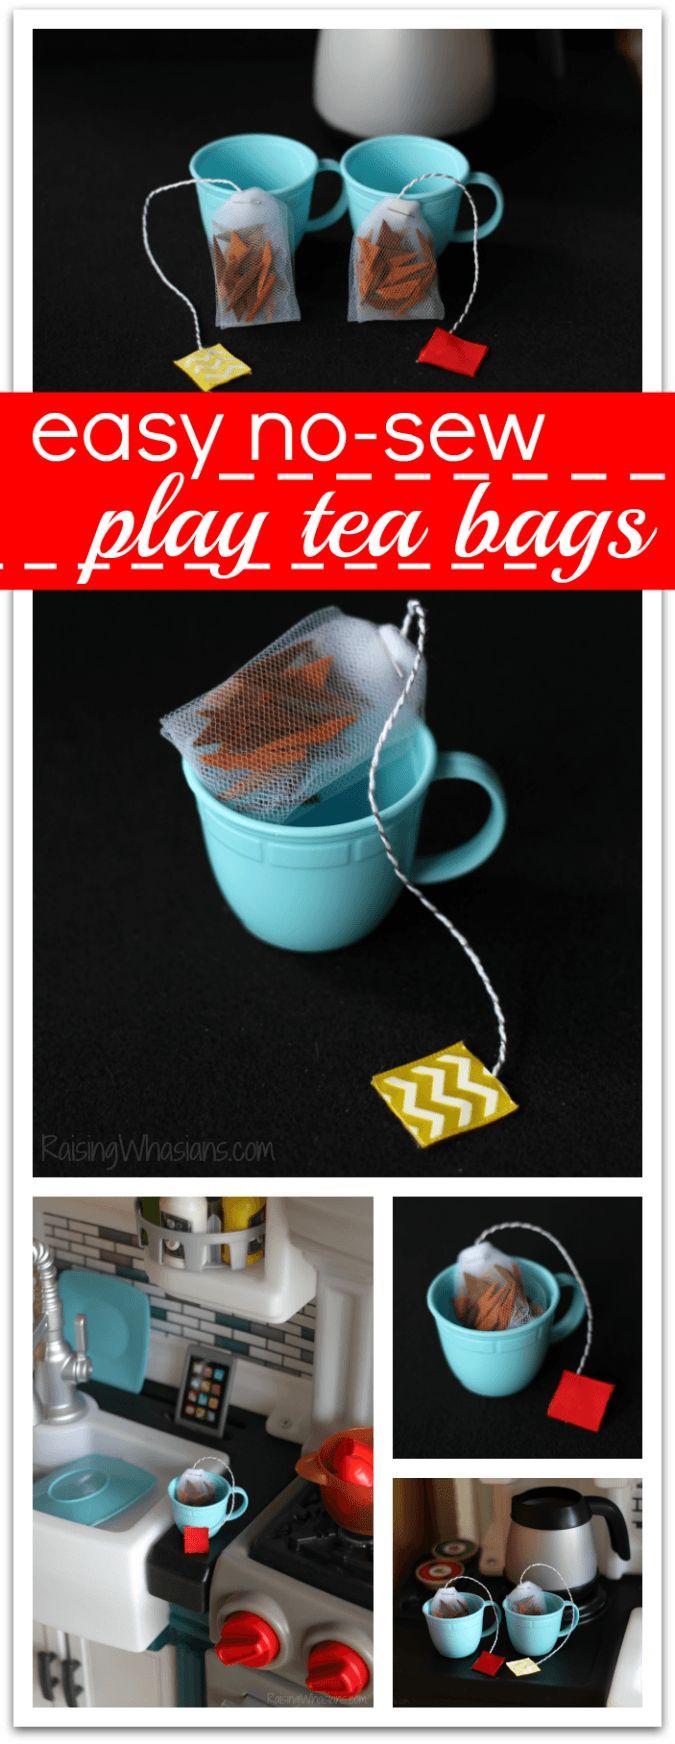 No Sew Play Tea Bags Tutorial + Pretend Kitchen Fun | DIY felt tea bags craft for kids (ad)